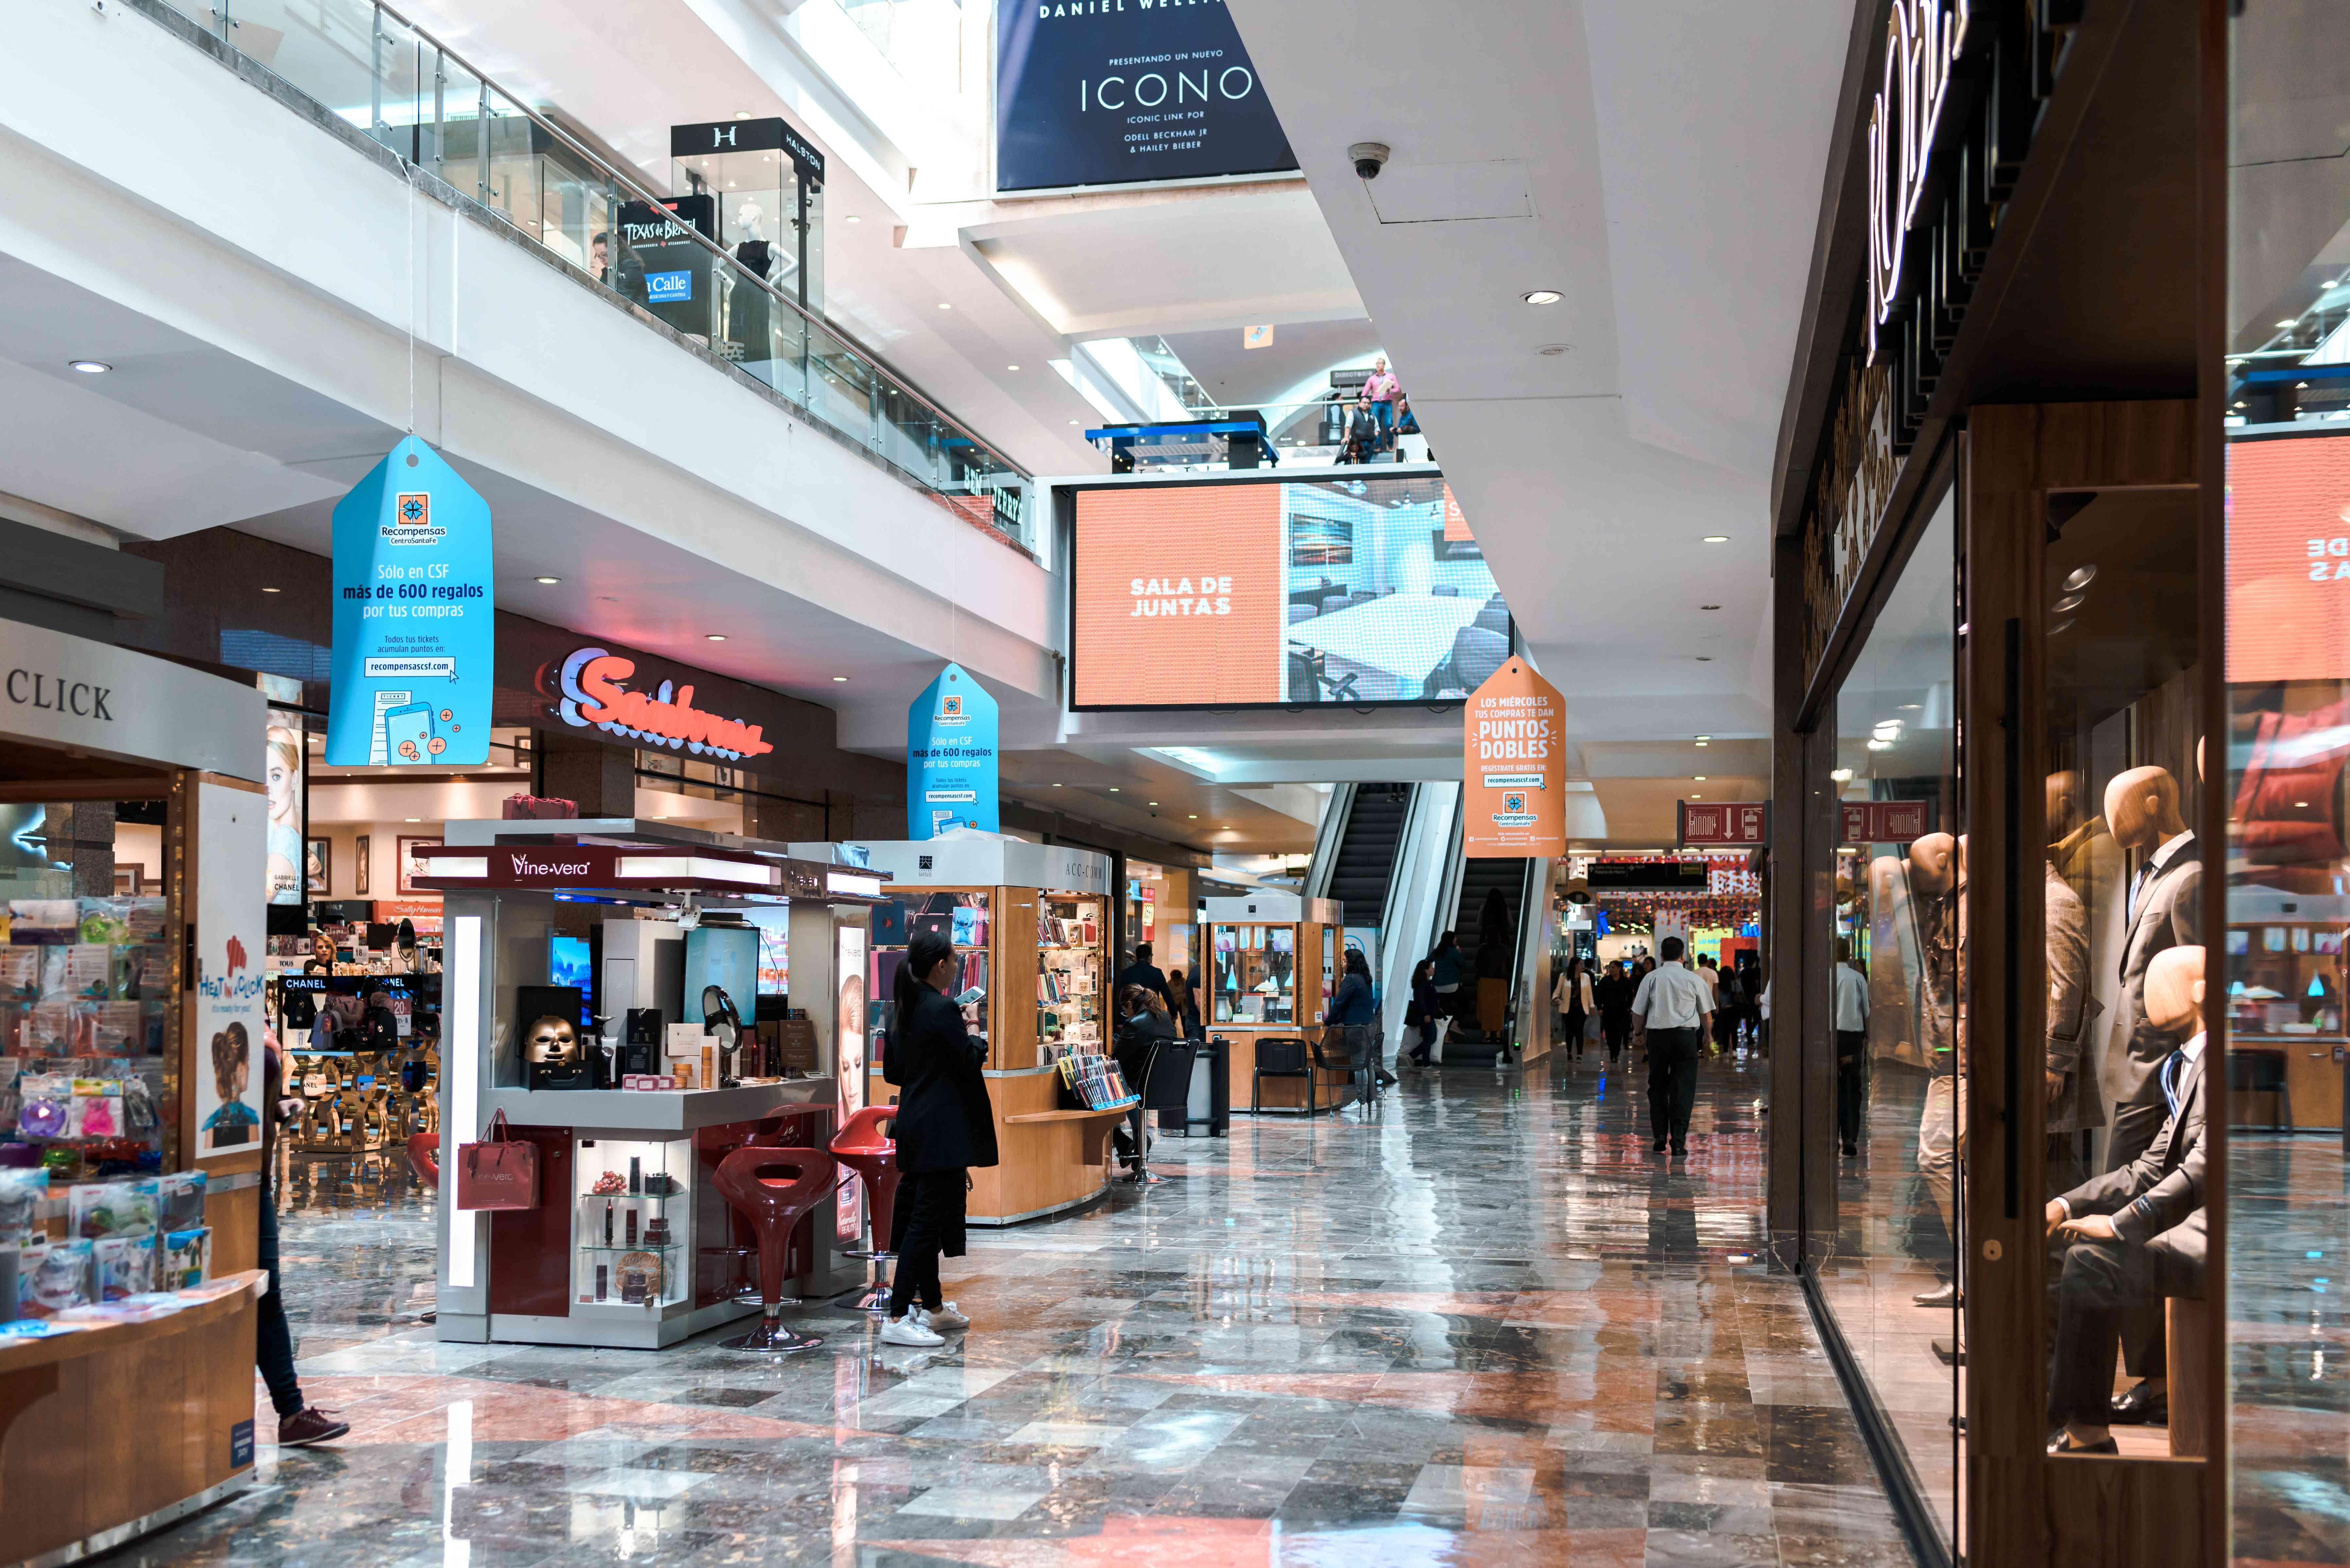 Shops on the inside of Centro Santa Fe